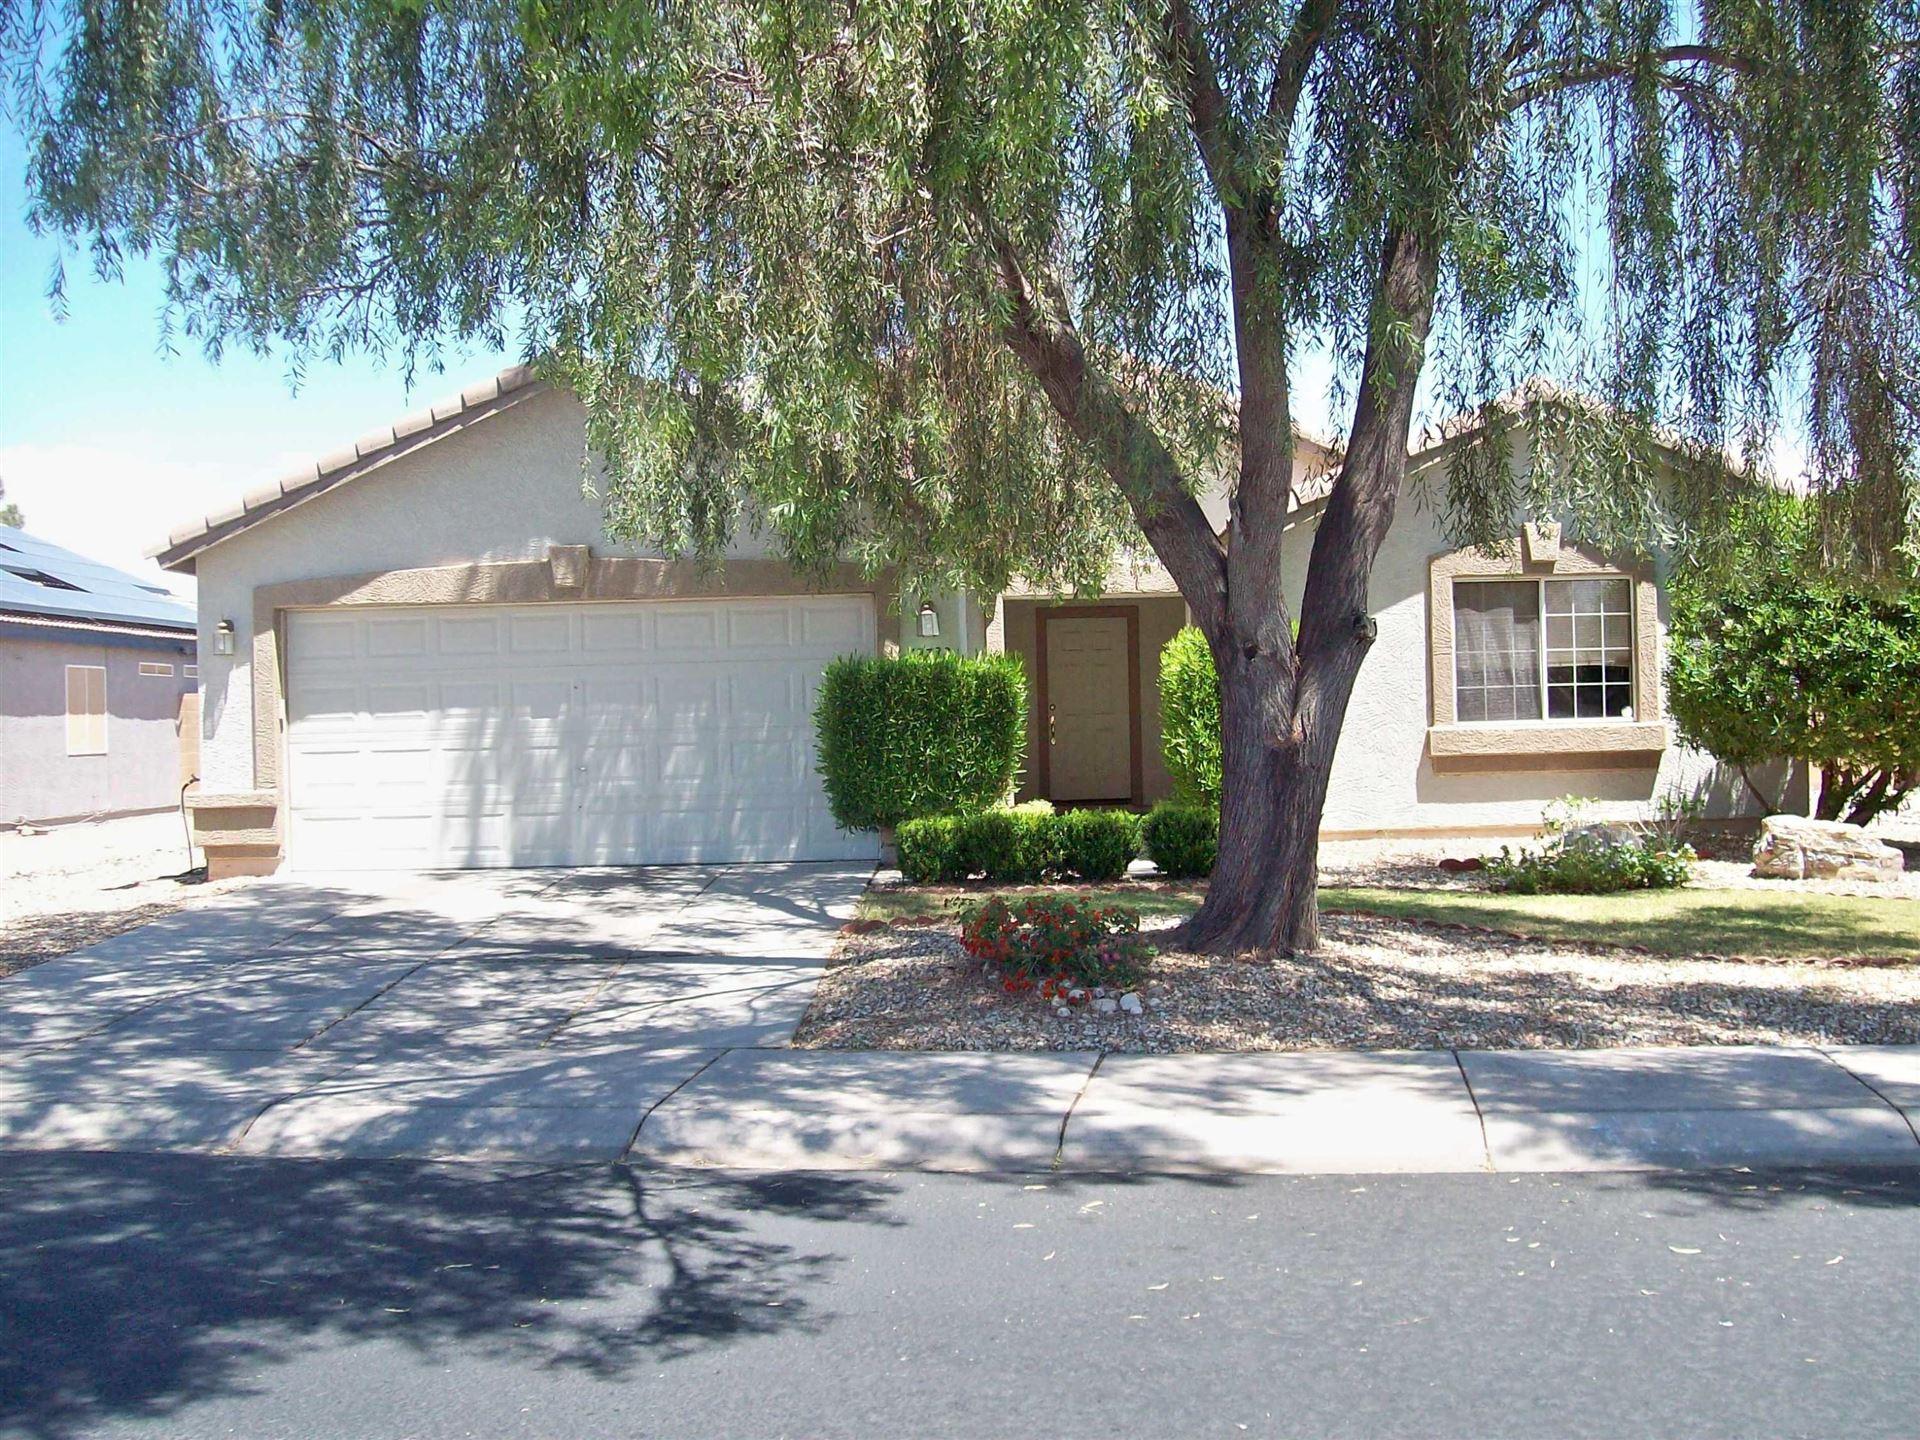 Photo of 12732 W LARKSPUR Road, El Mirage, AZ 85335 (MLS # 6228145)